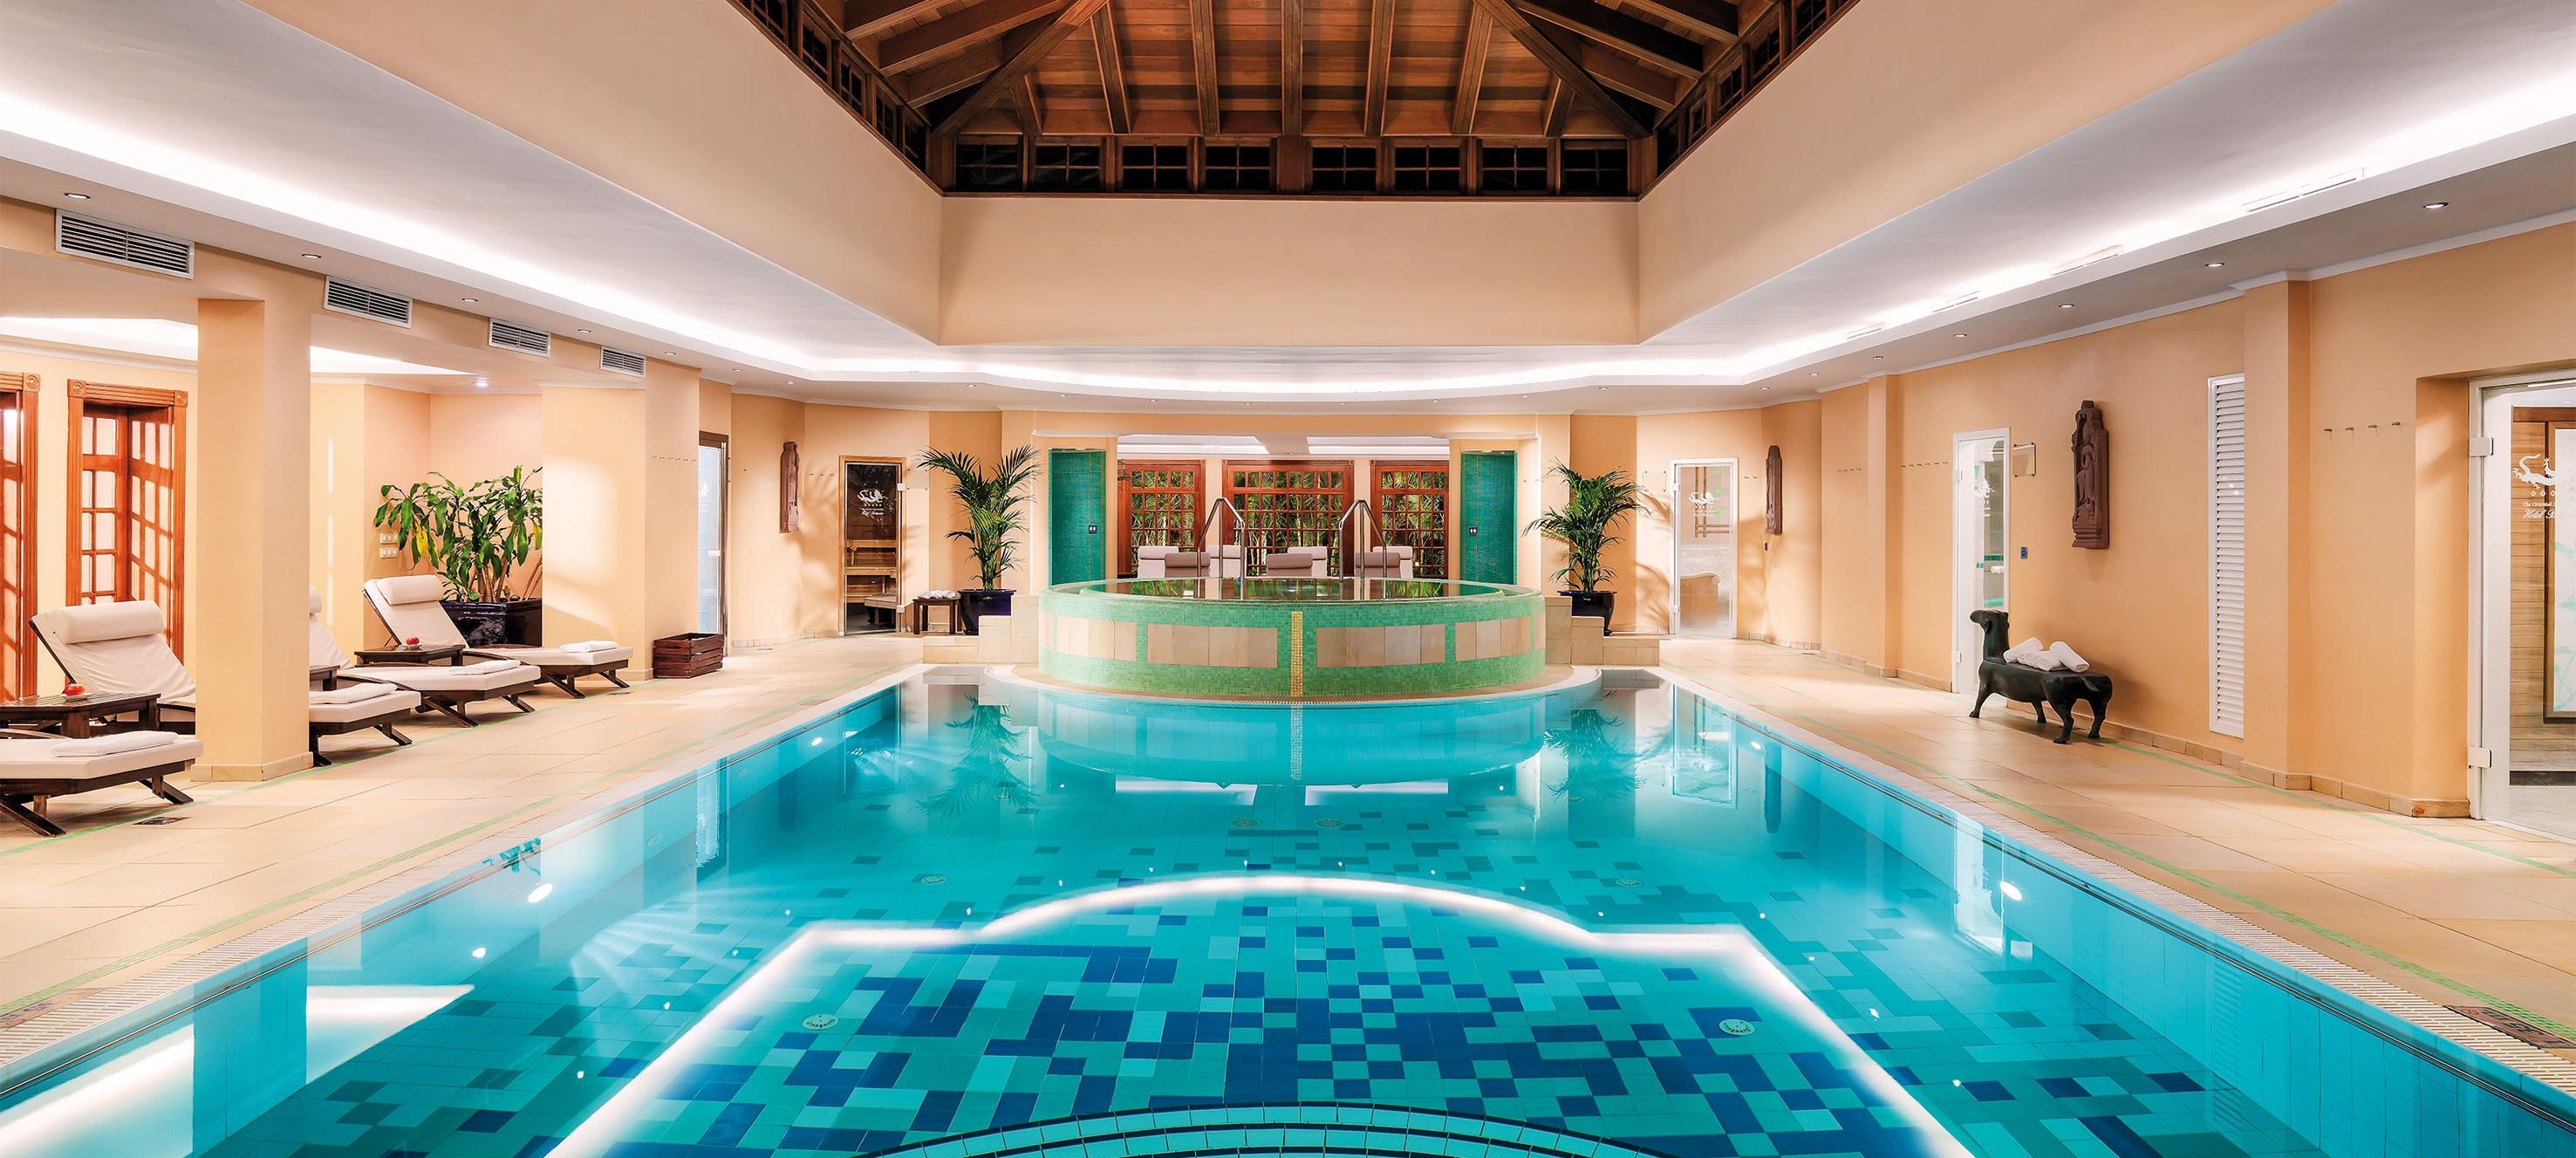 hotel-botanico-tenerife-spa-pool